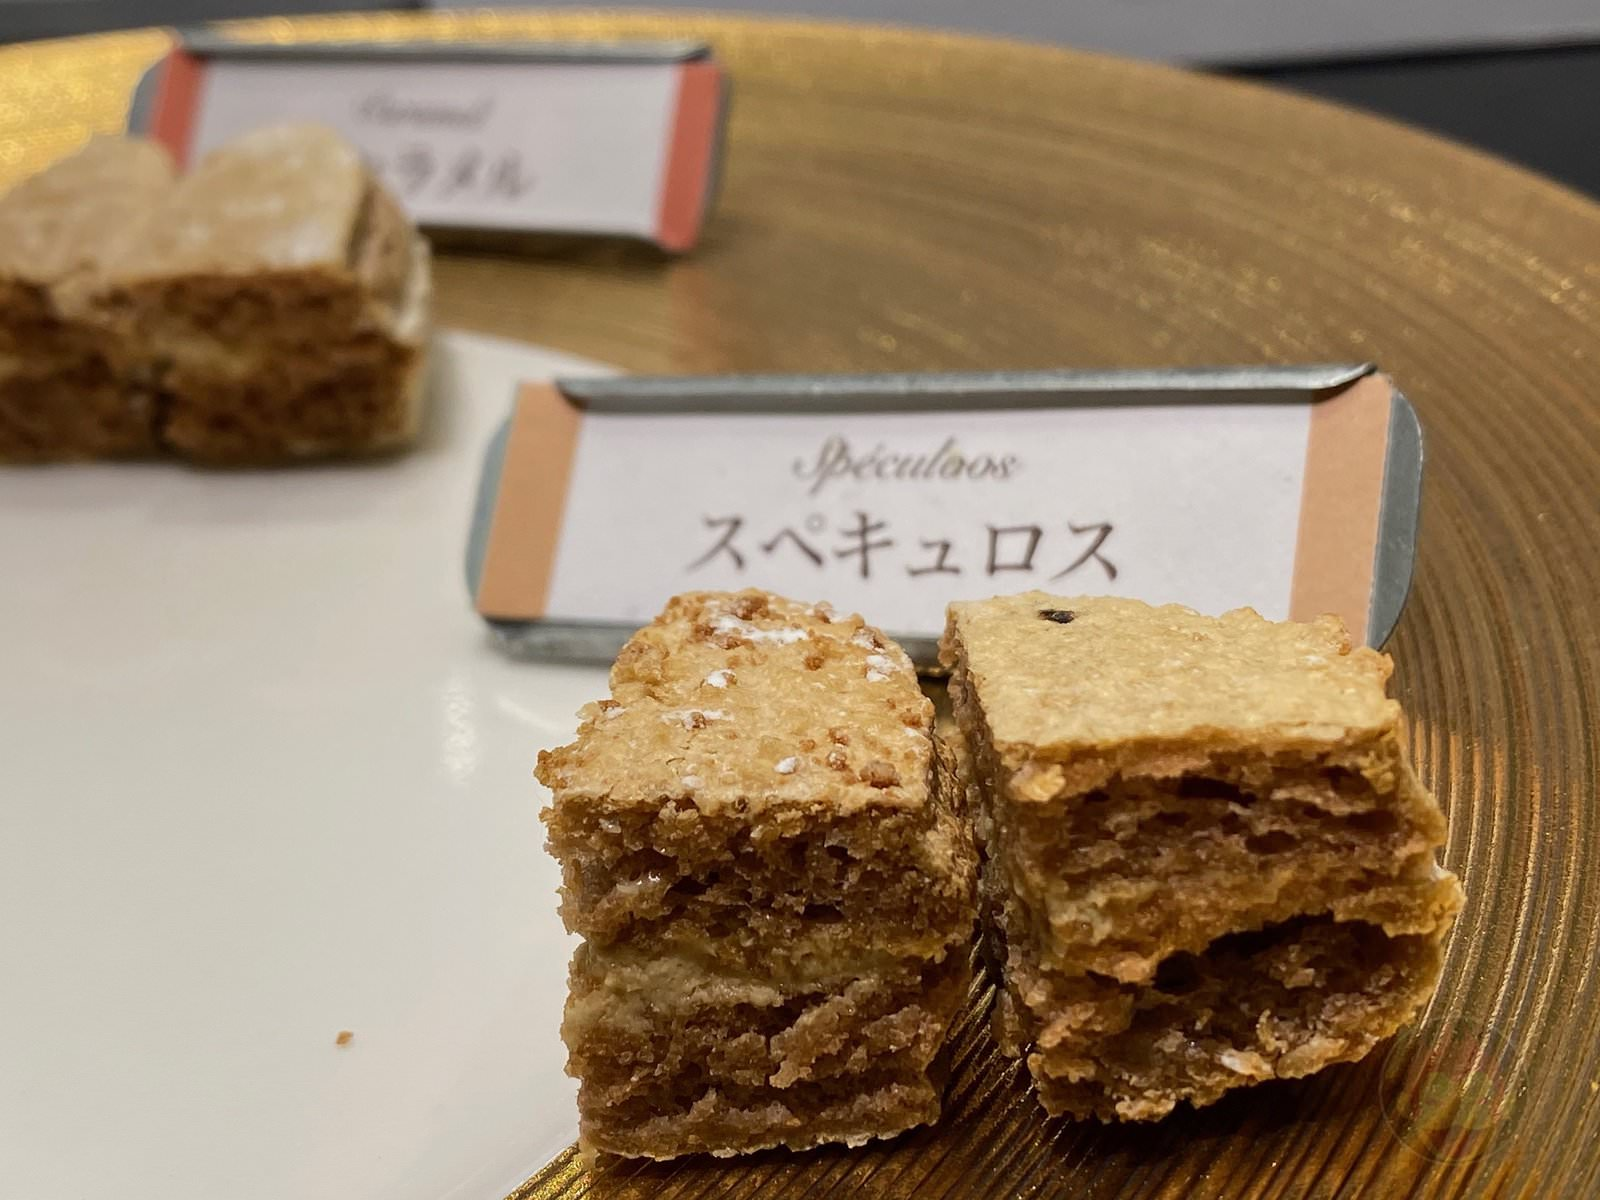 Shibuya-Scramble-Square-Food-I-Ate-90.jpeg